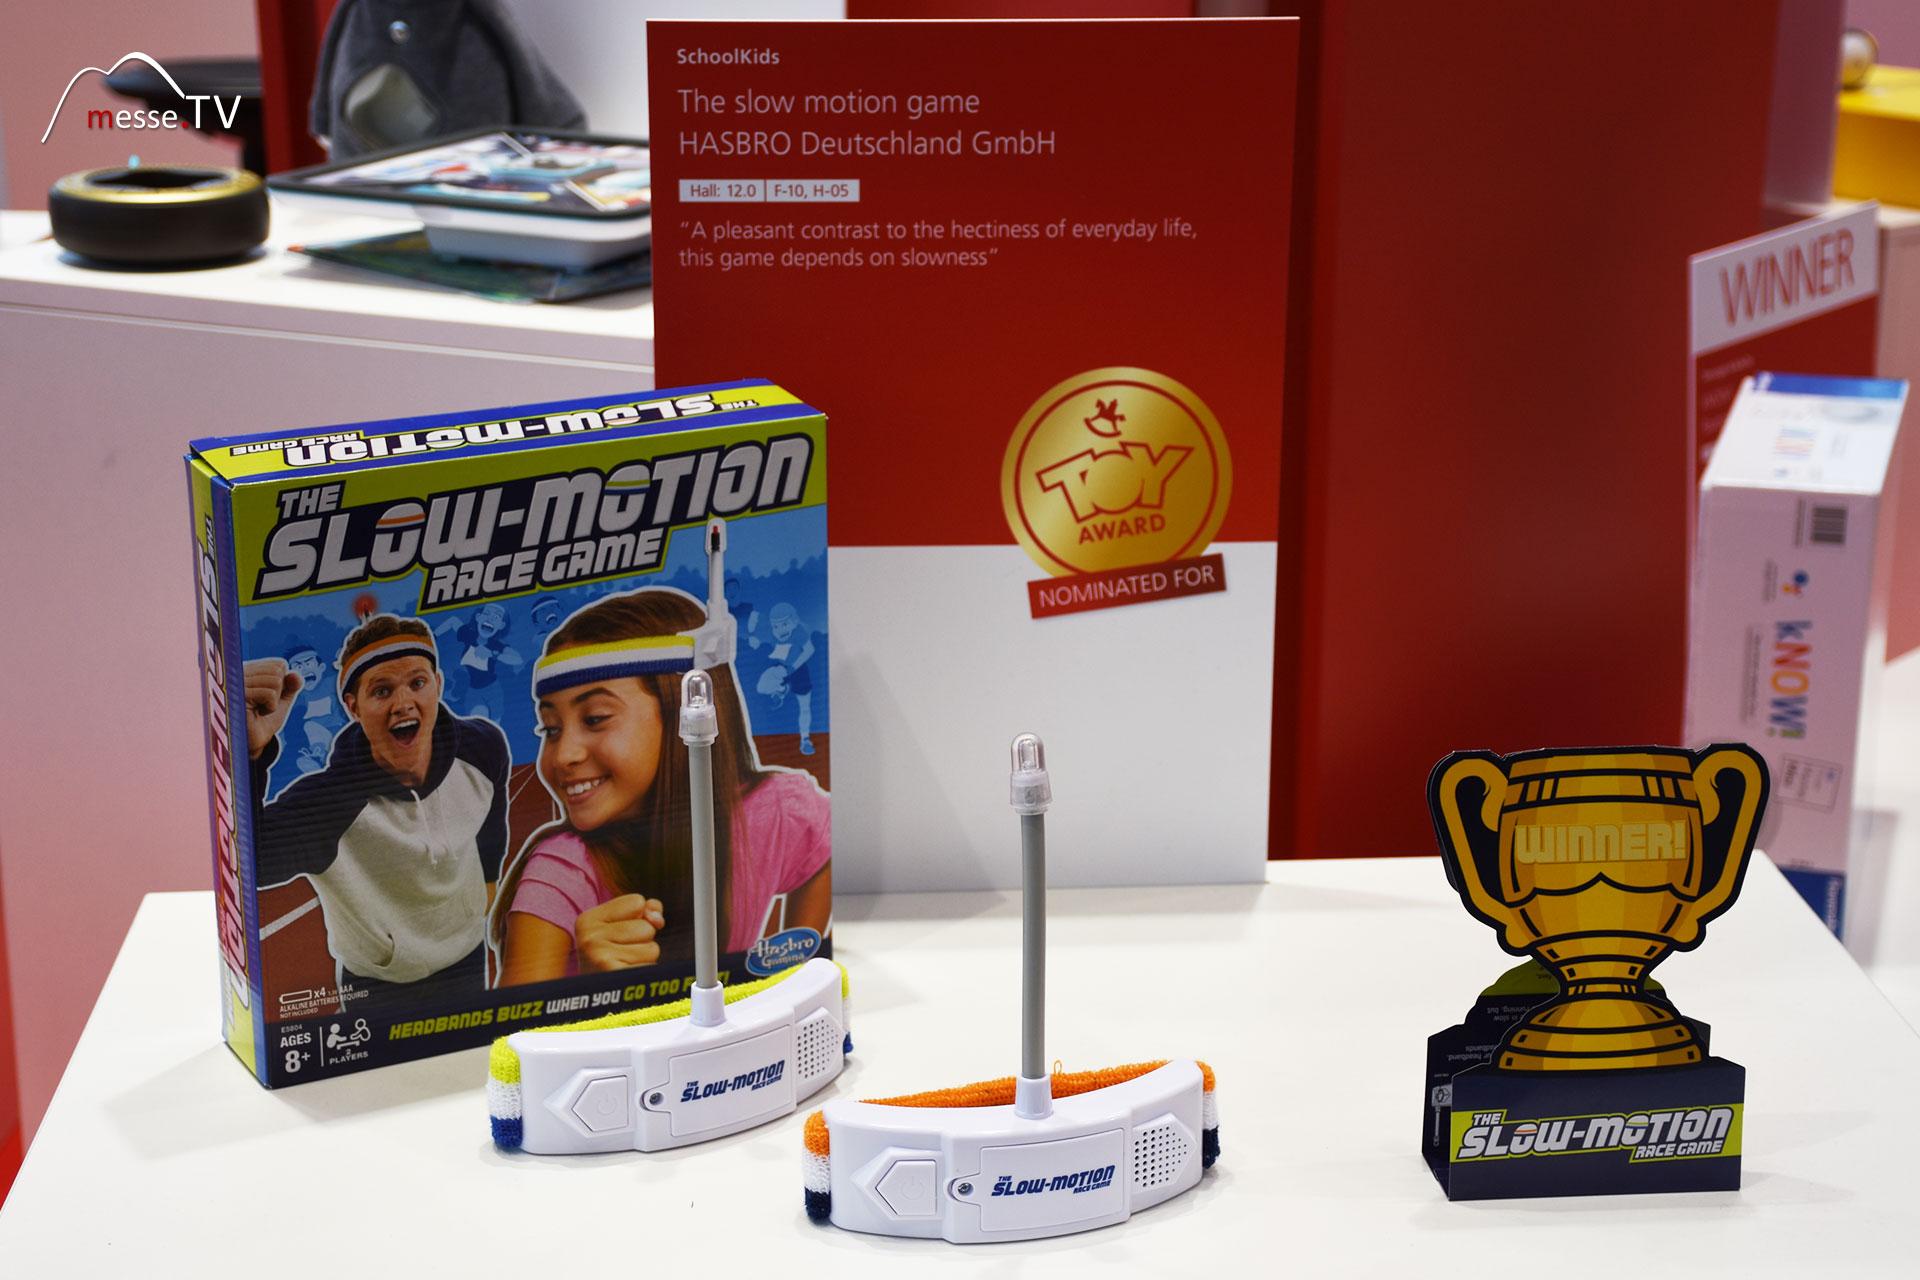 Hasbro Deutschland - The slow motion game